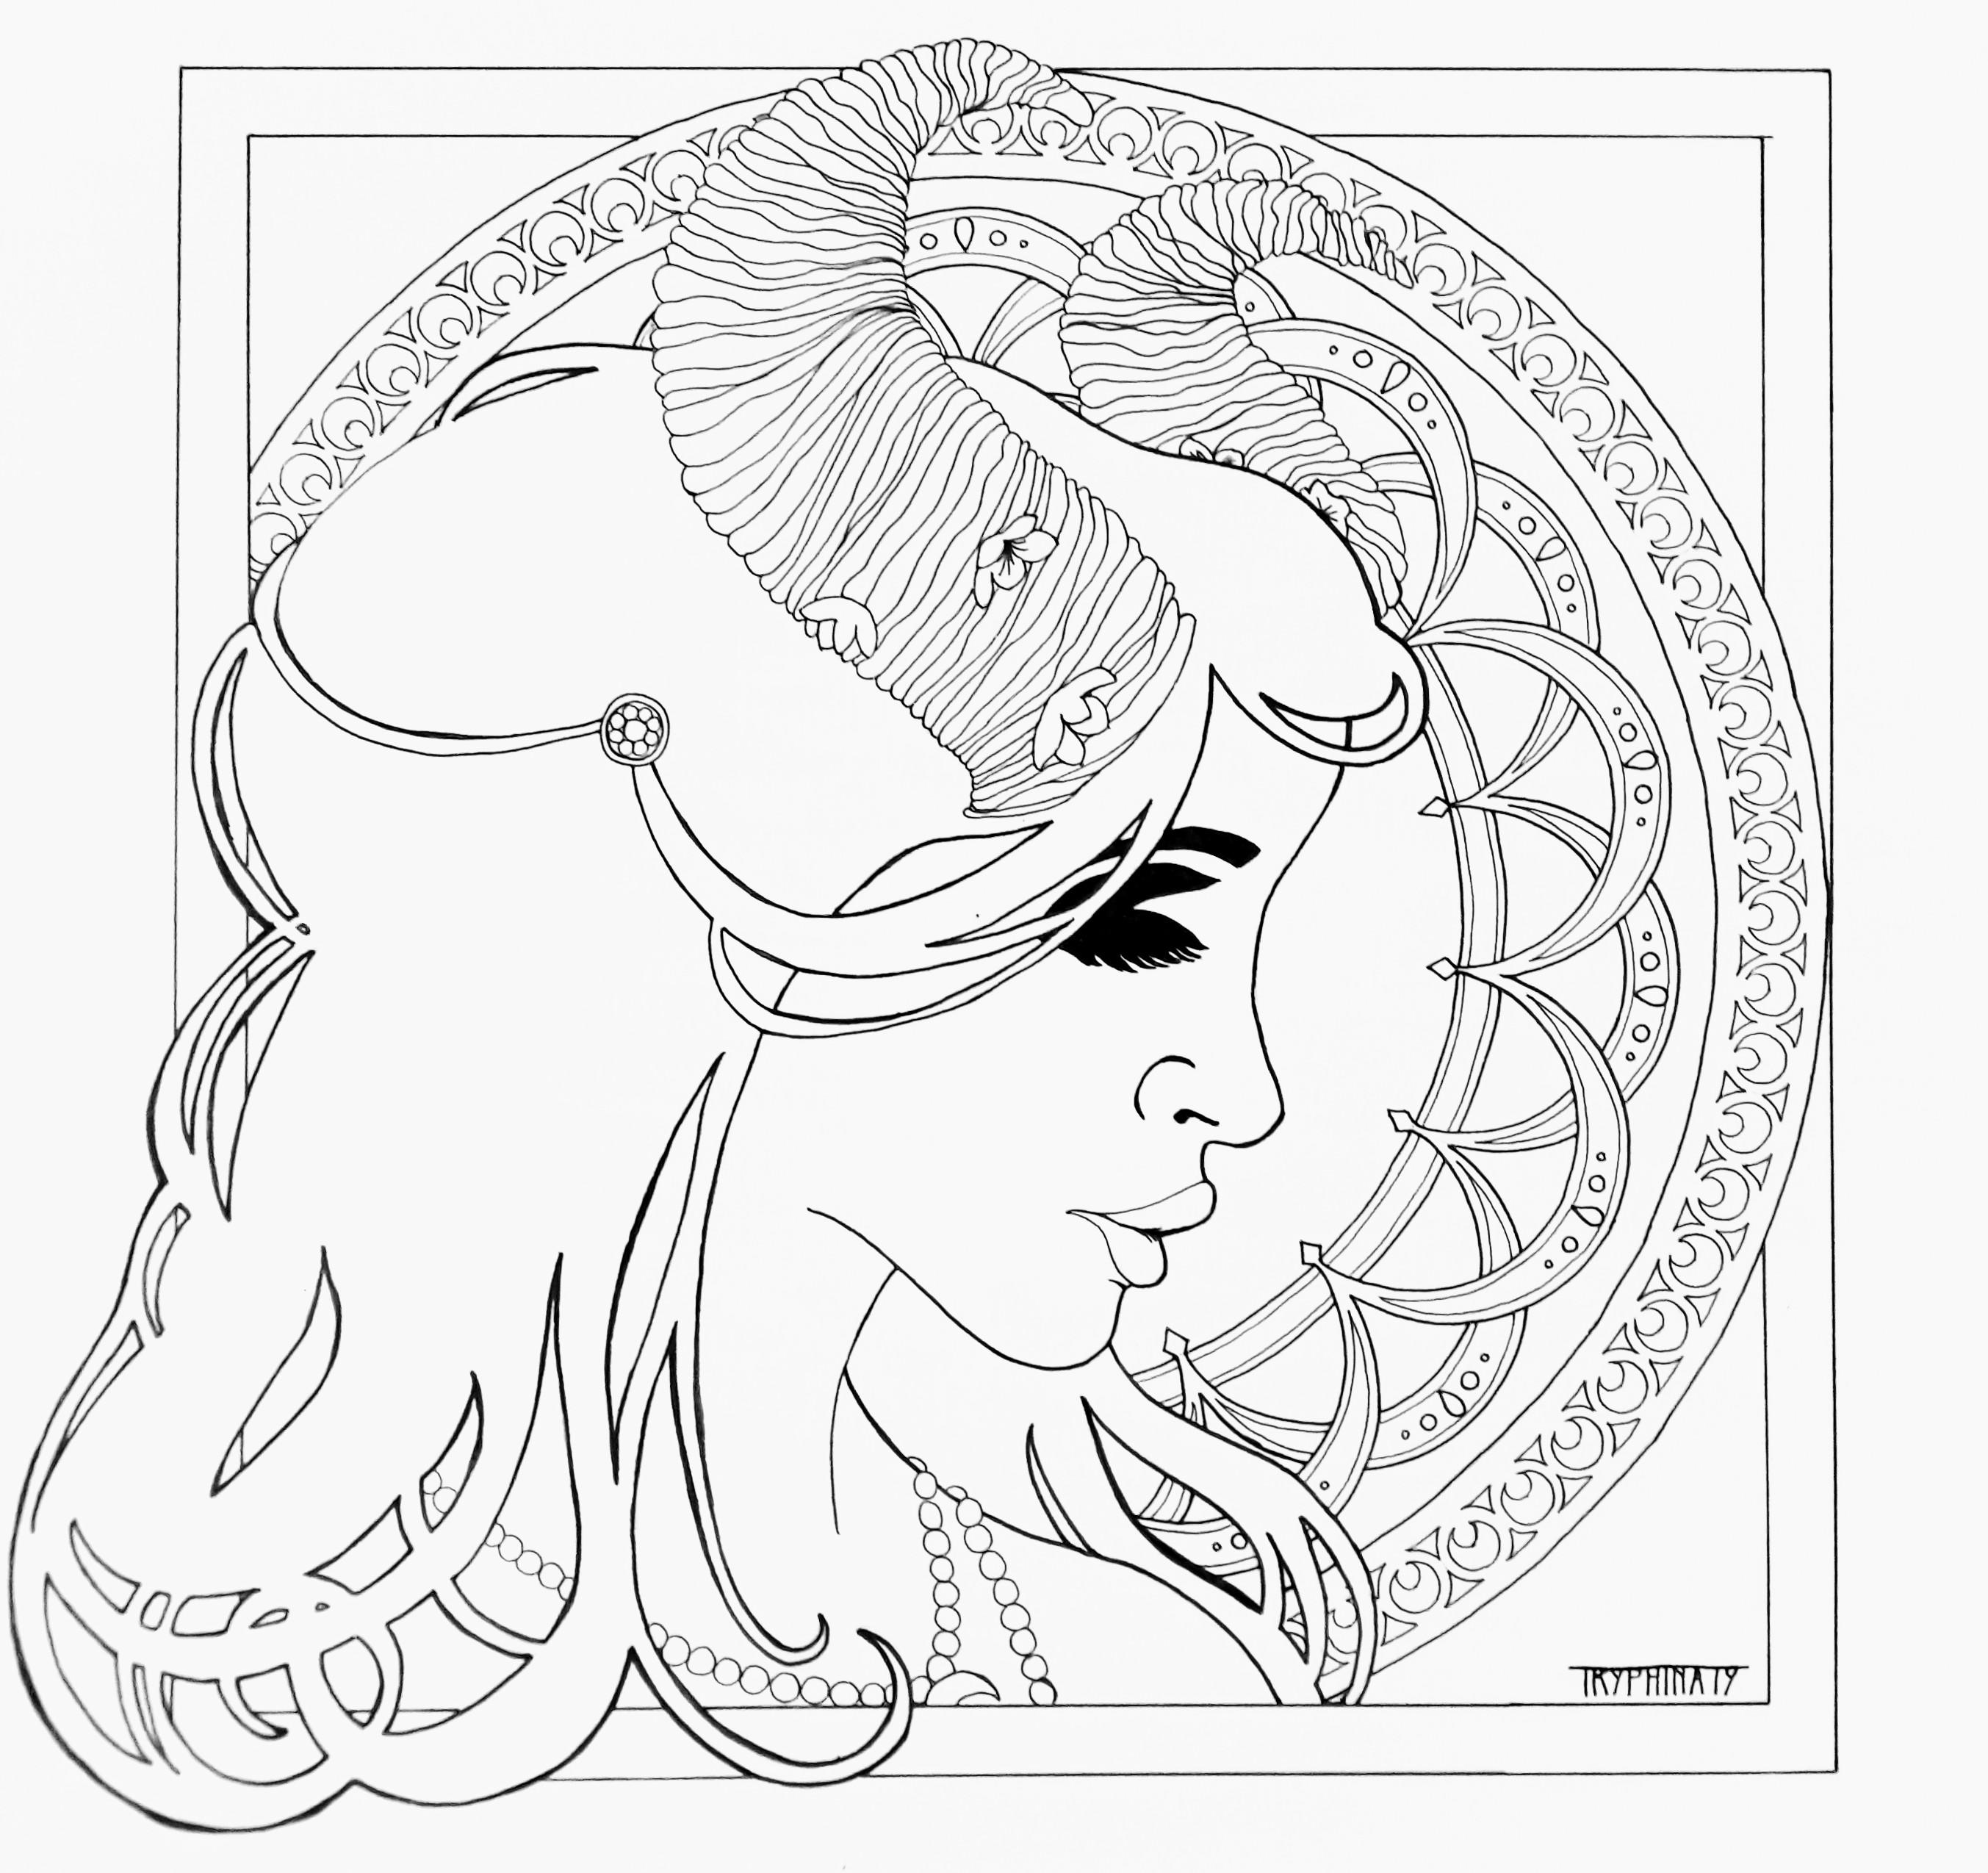 side view portrait of a woman with rams horn, art nouveau style